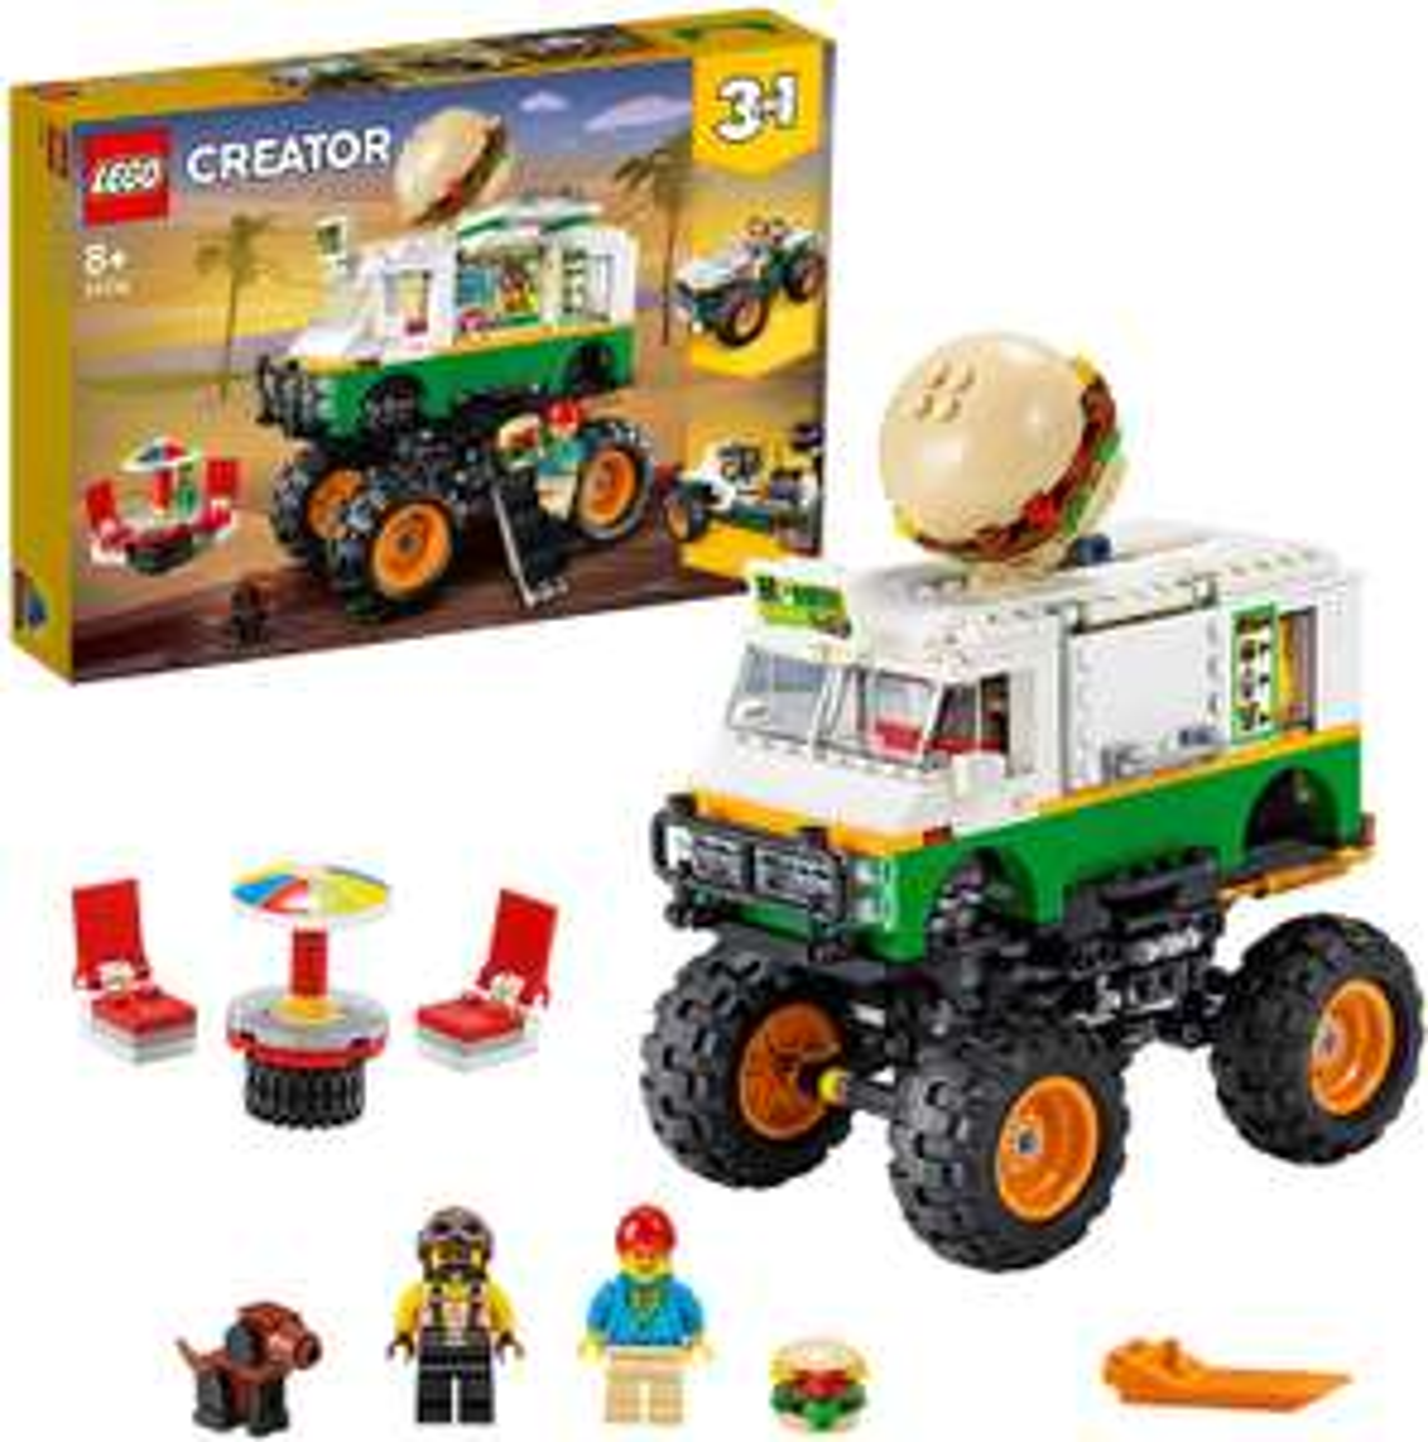 Lego Creator 31104 3 in 1 Monster Burger Truck £21.38 Amazon